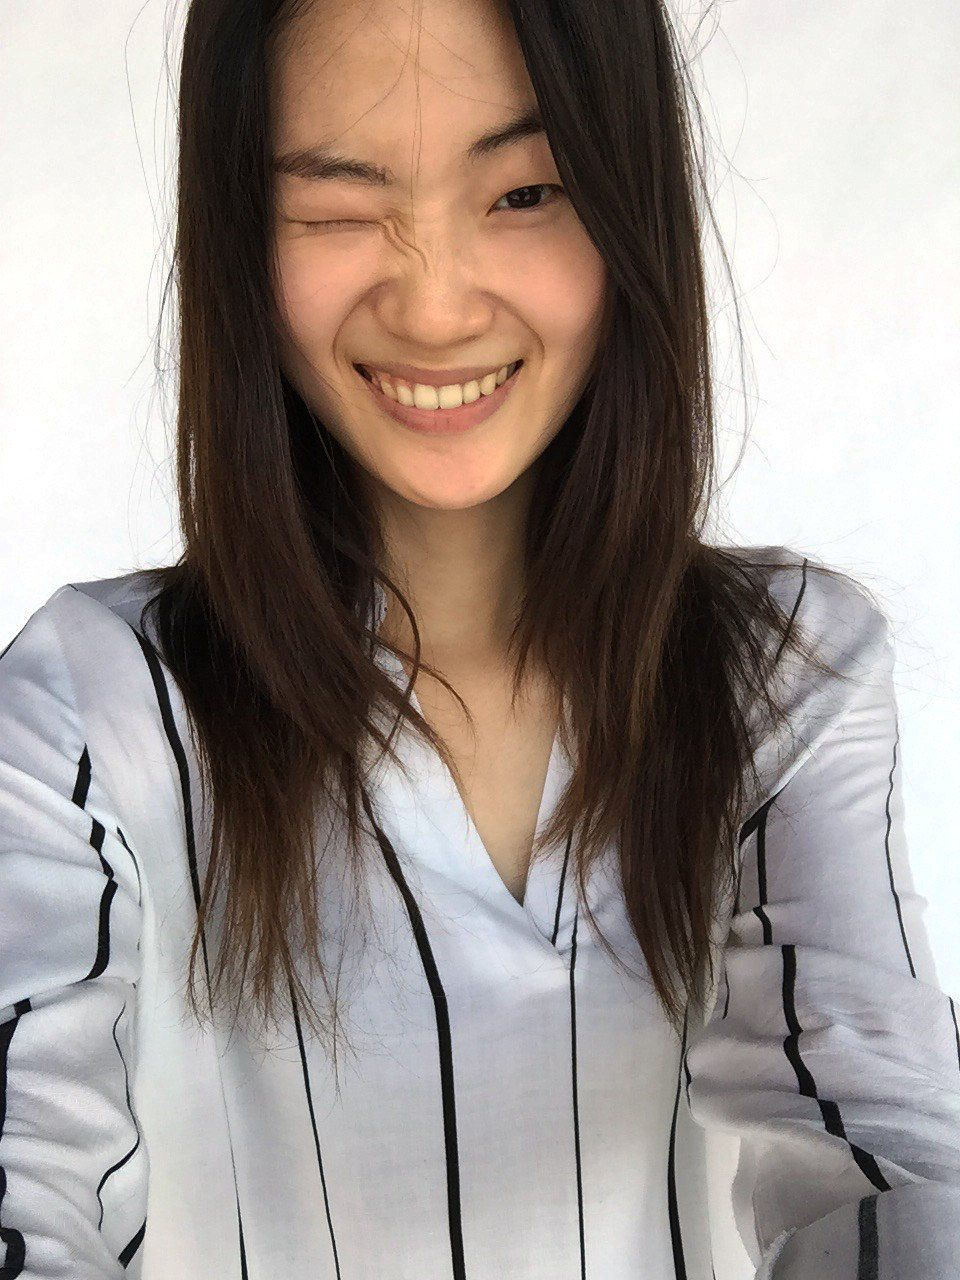 Is a cute Hyun Ji Shin nude photos 2019